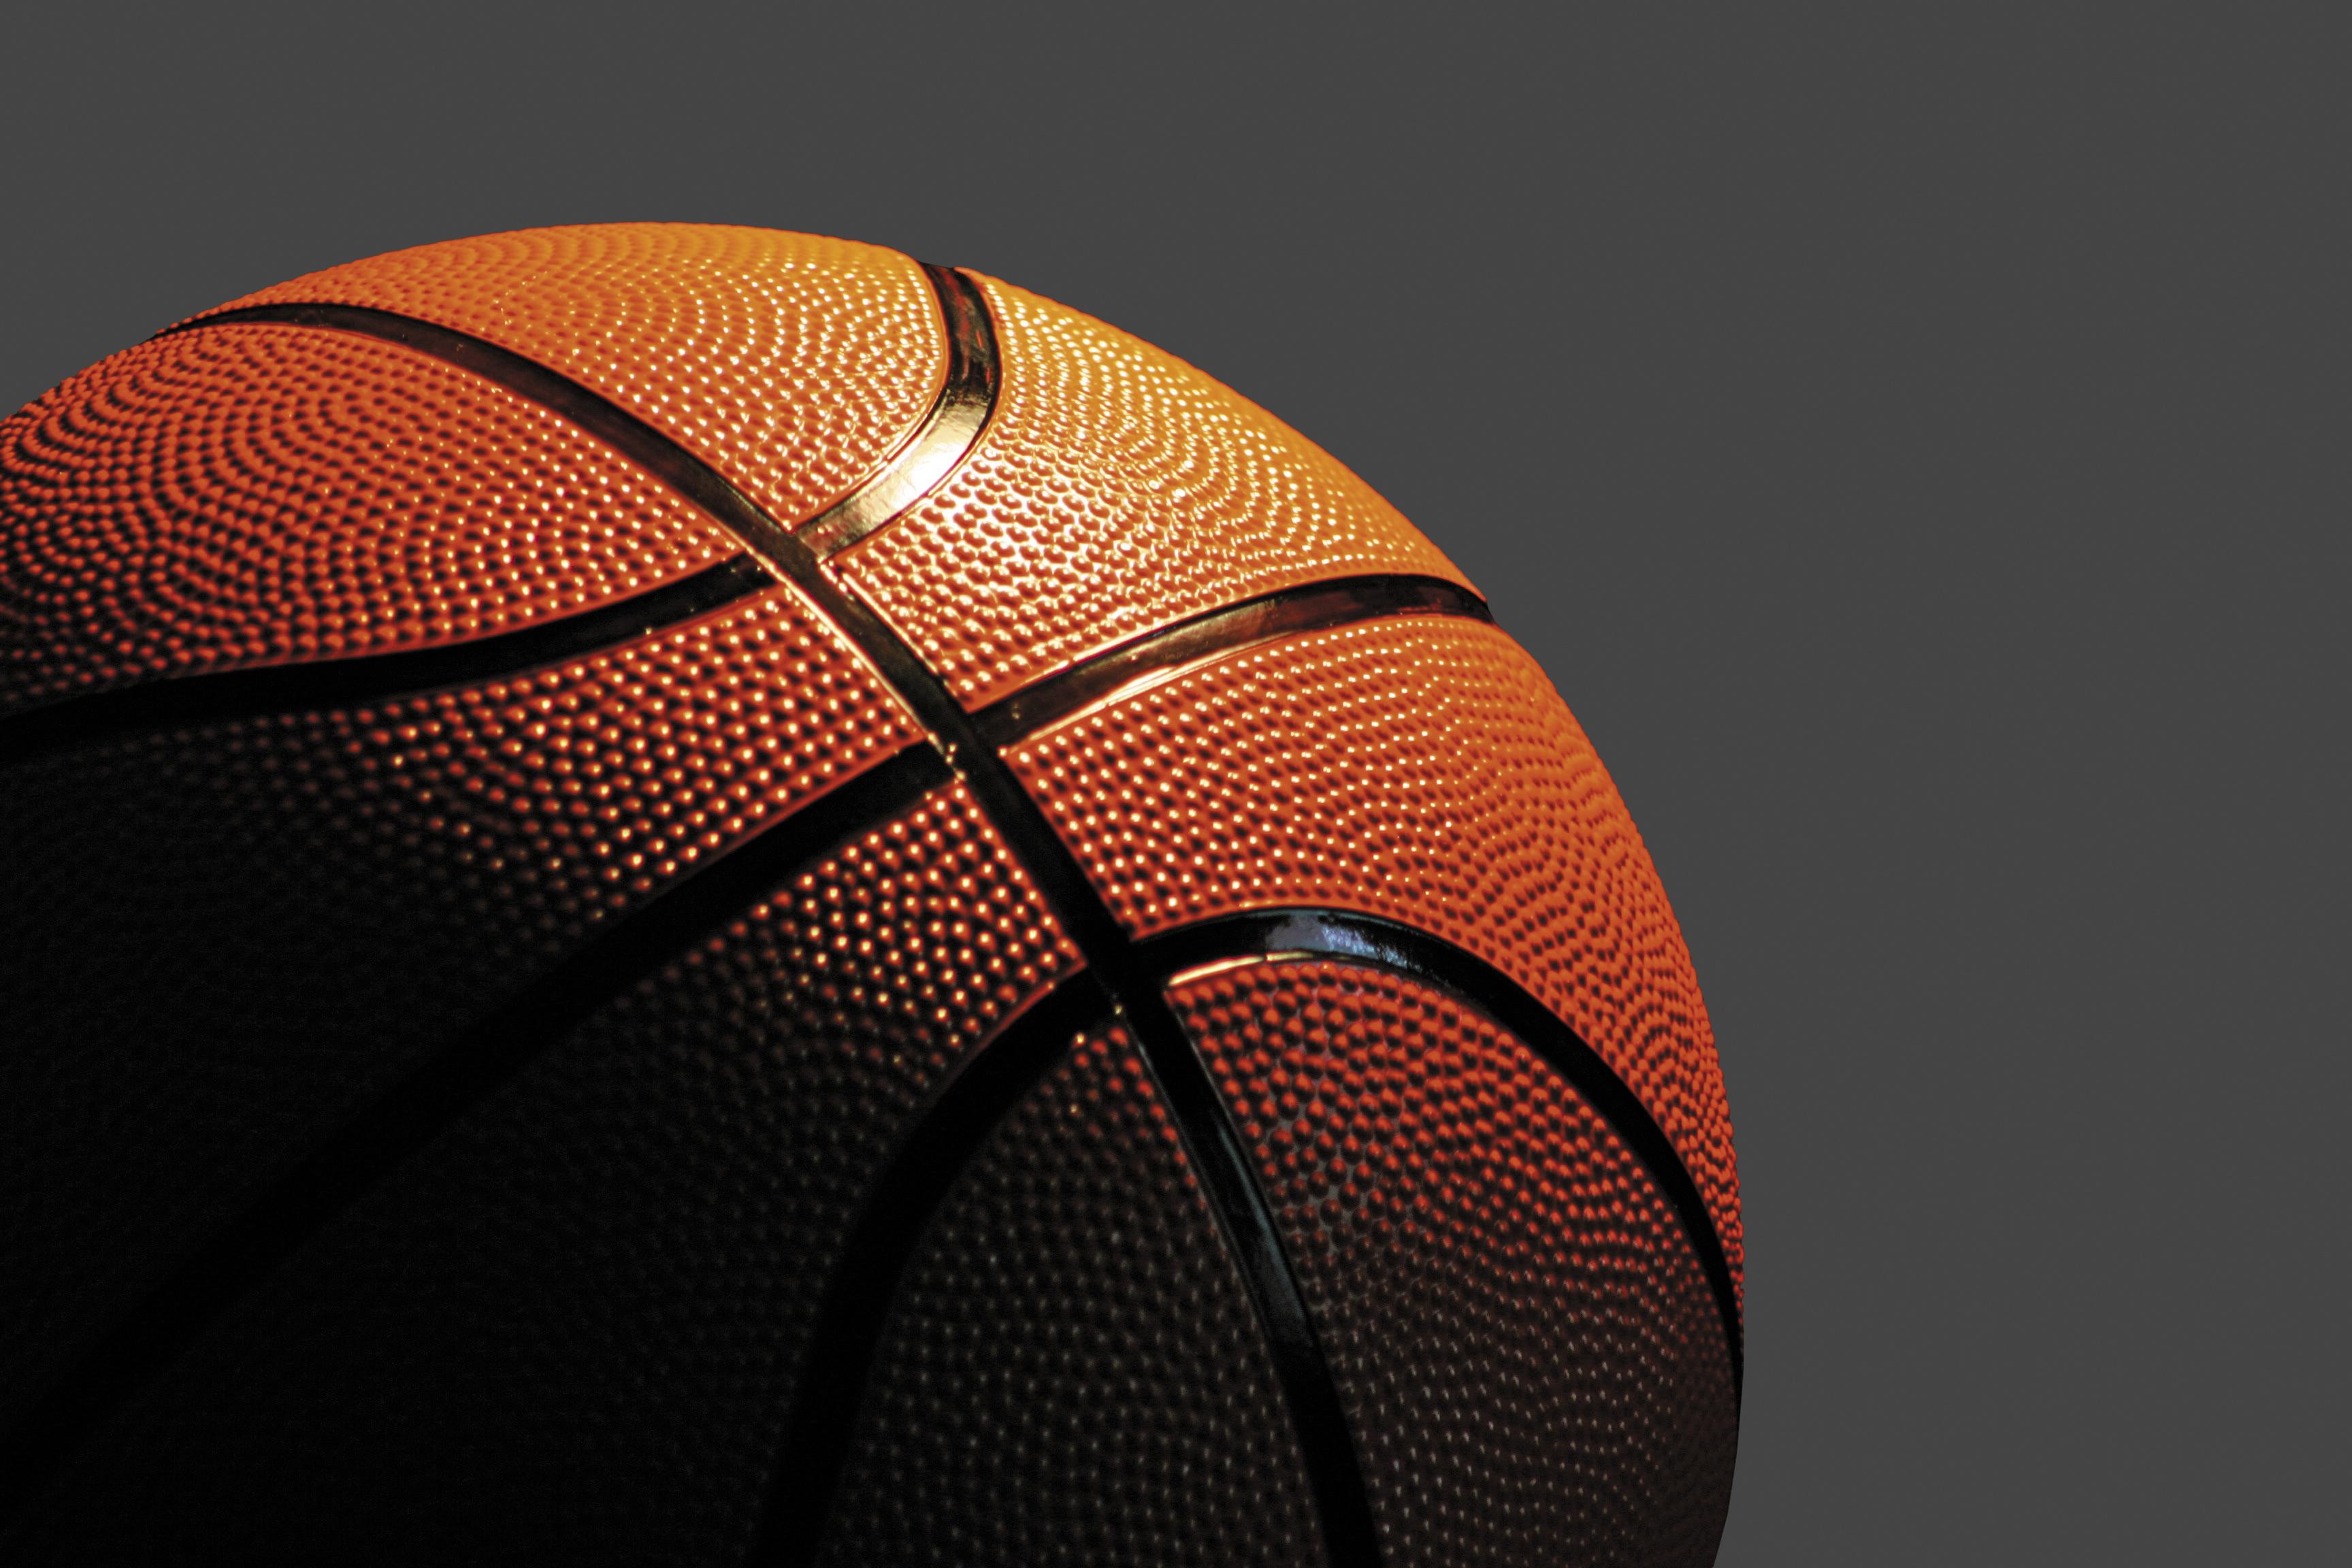 мяч, фото, обои, баскетбол